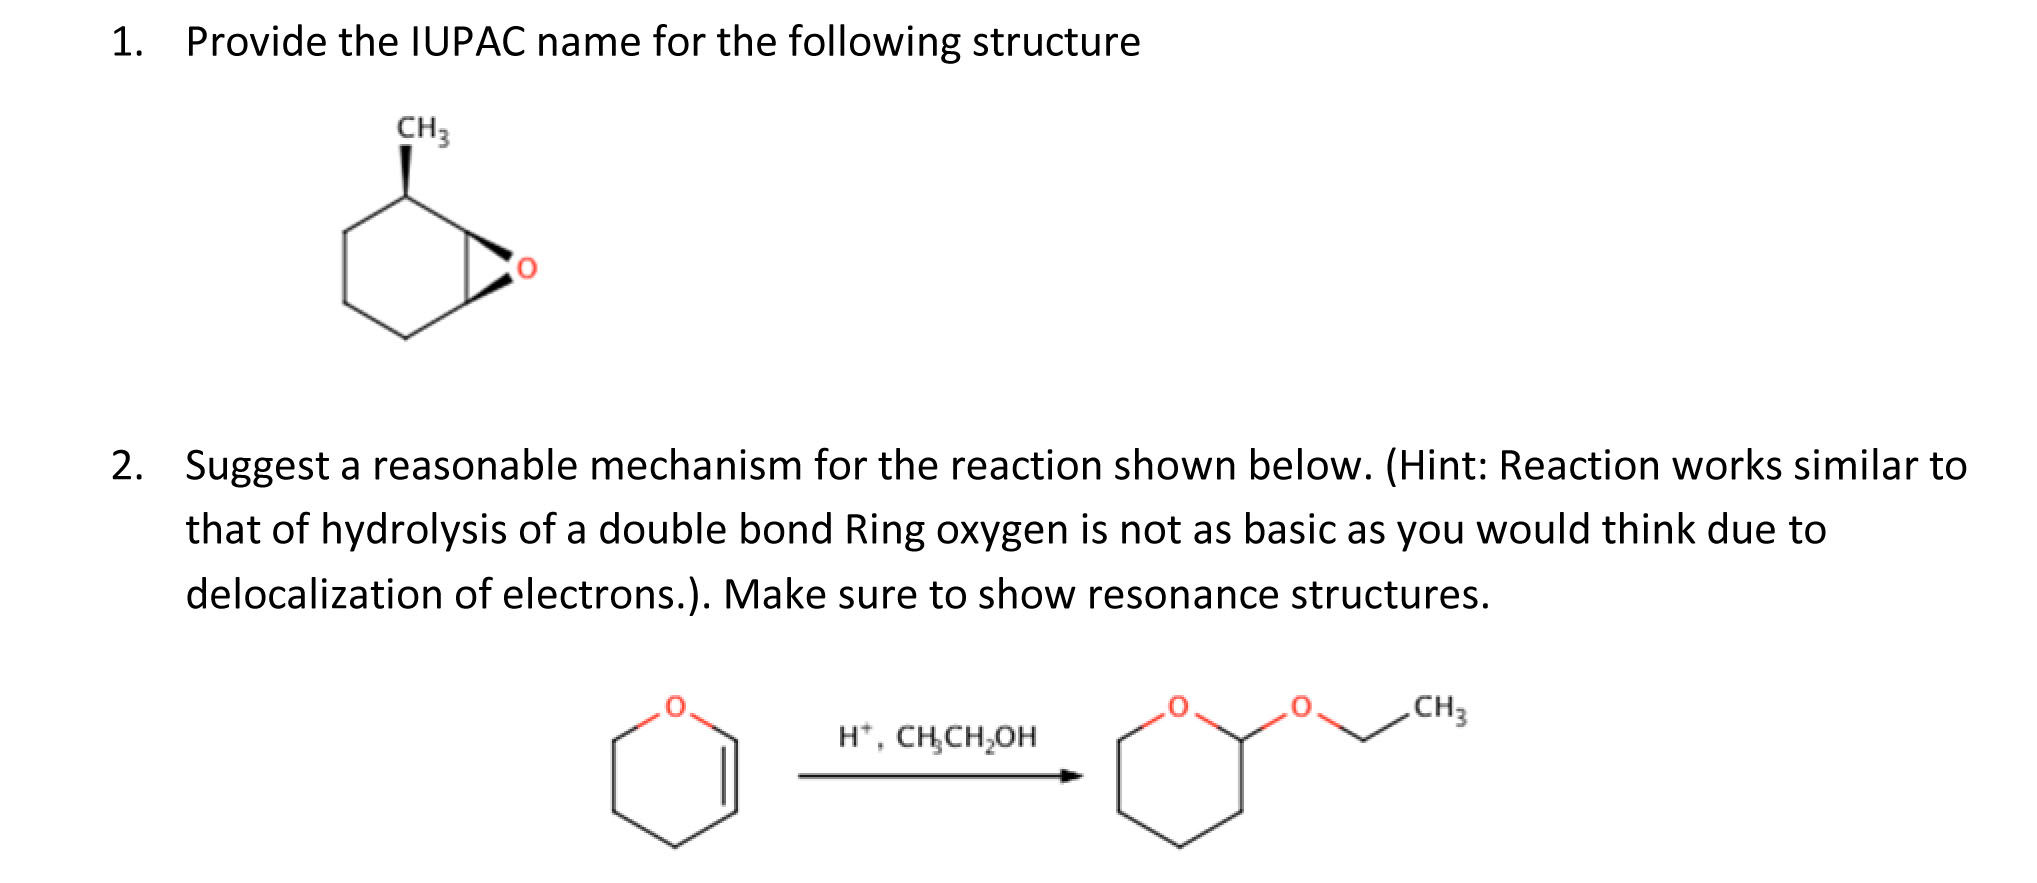 the yielding of isoamyl acetate by reacting acetic acid isoamyl alcohol